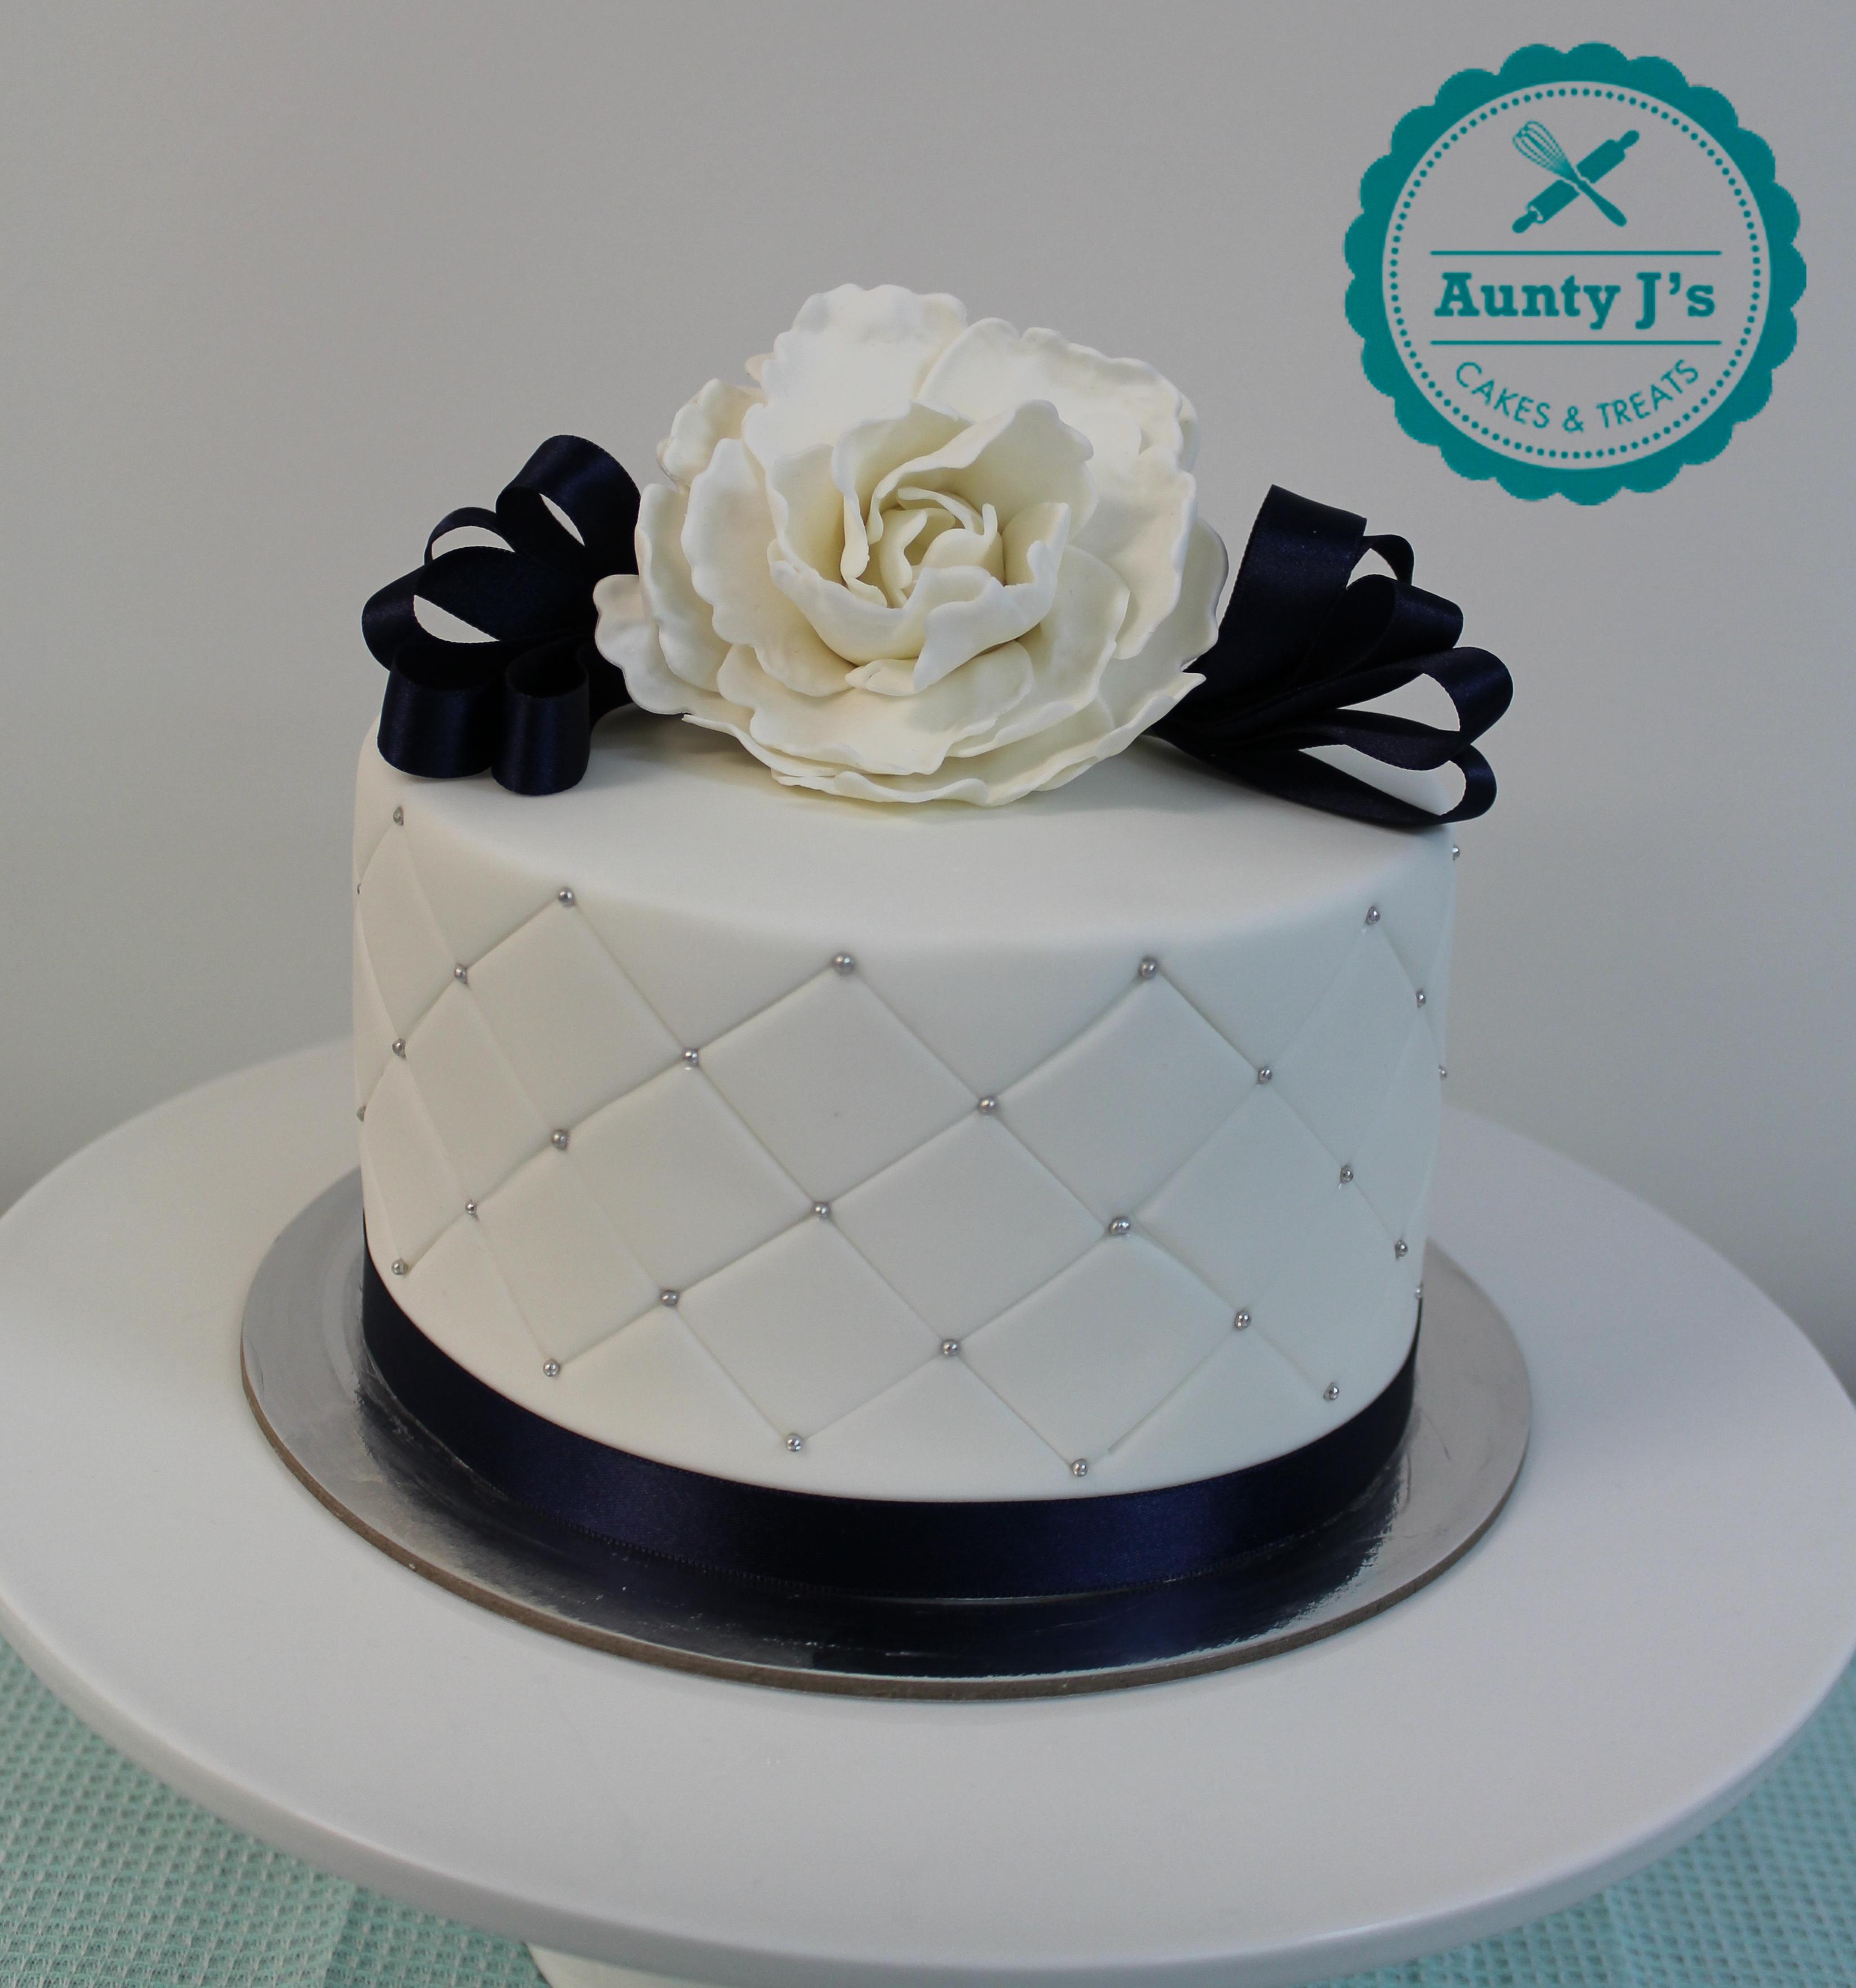 Awe Inspiring Navy Birthday Cake Aunty Js Cakes Treats Funny Birthday Cards Online Fluifree Goldxyz